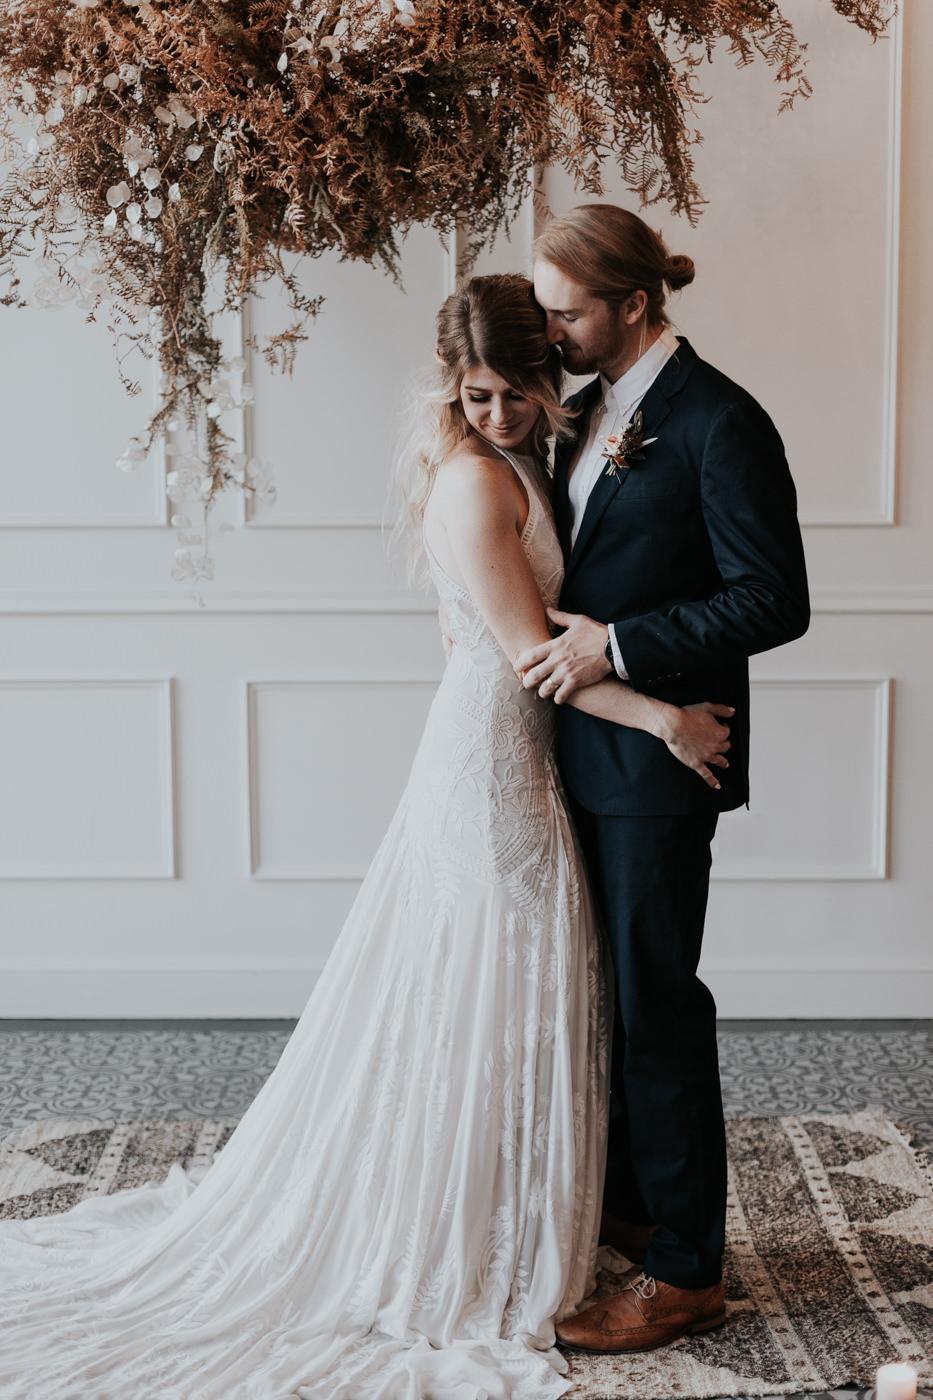 boho wedding dress and navy groom suit with dried foliage wedding ceremony backdrop